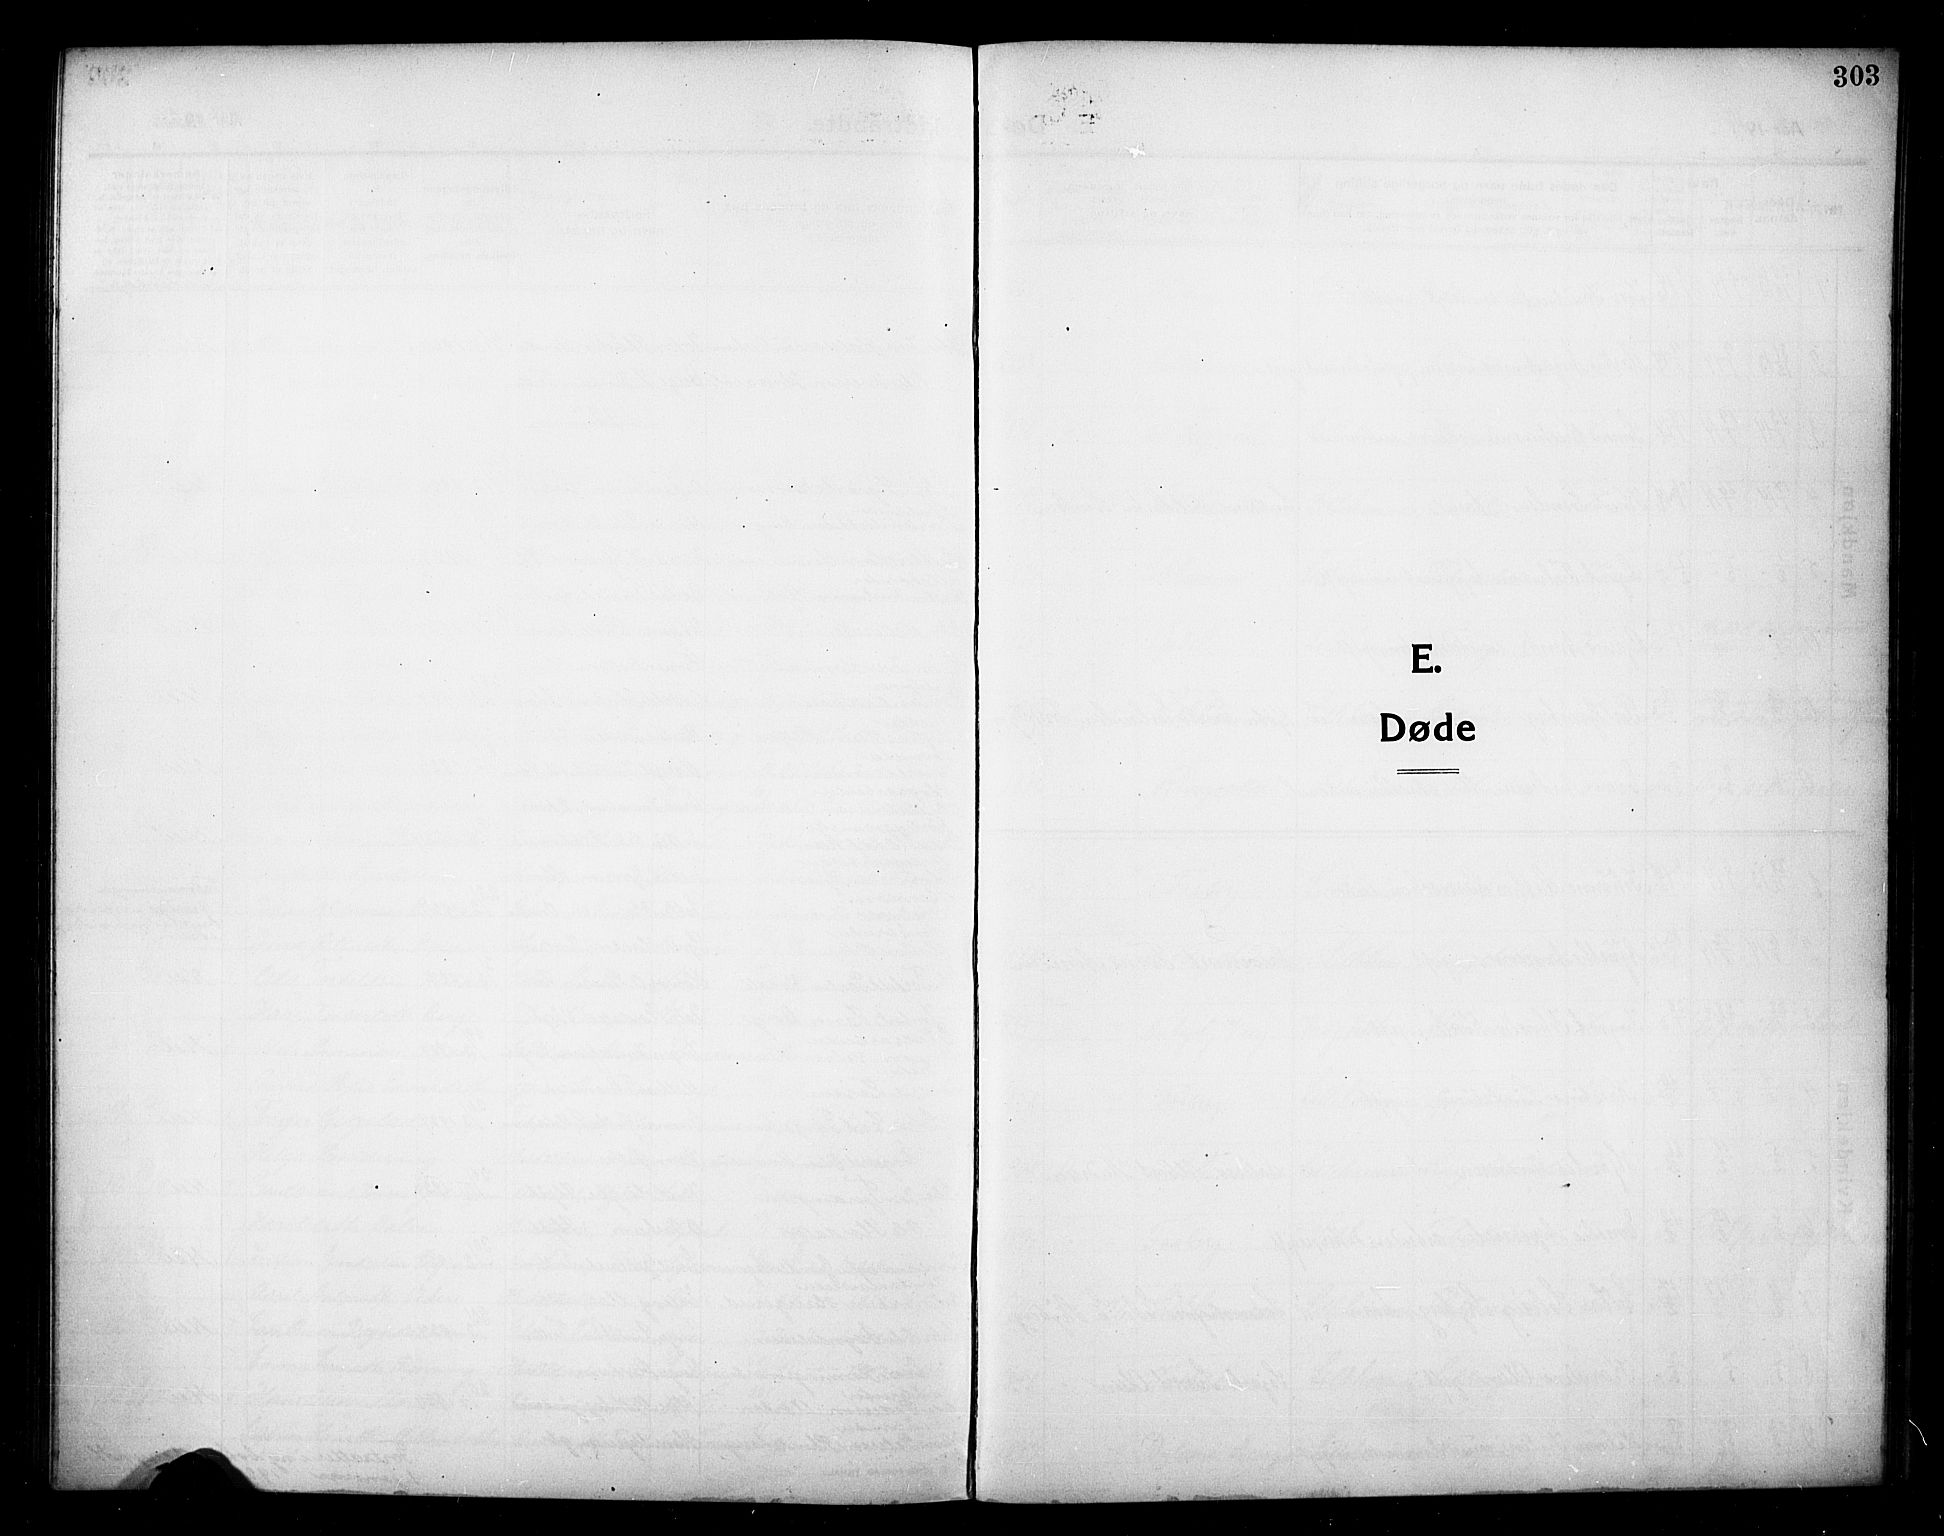 SAH, Lillehammer prestekontor, H/Ha/Hab/L0002: Parish register (copy) no. 2, 1913-1929, p. 303